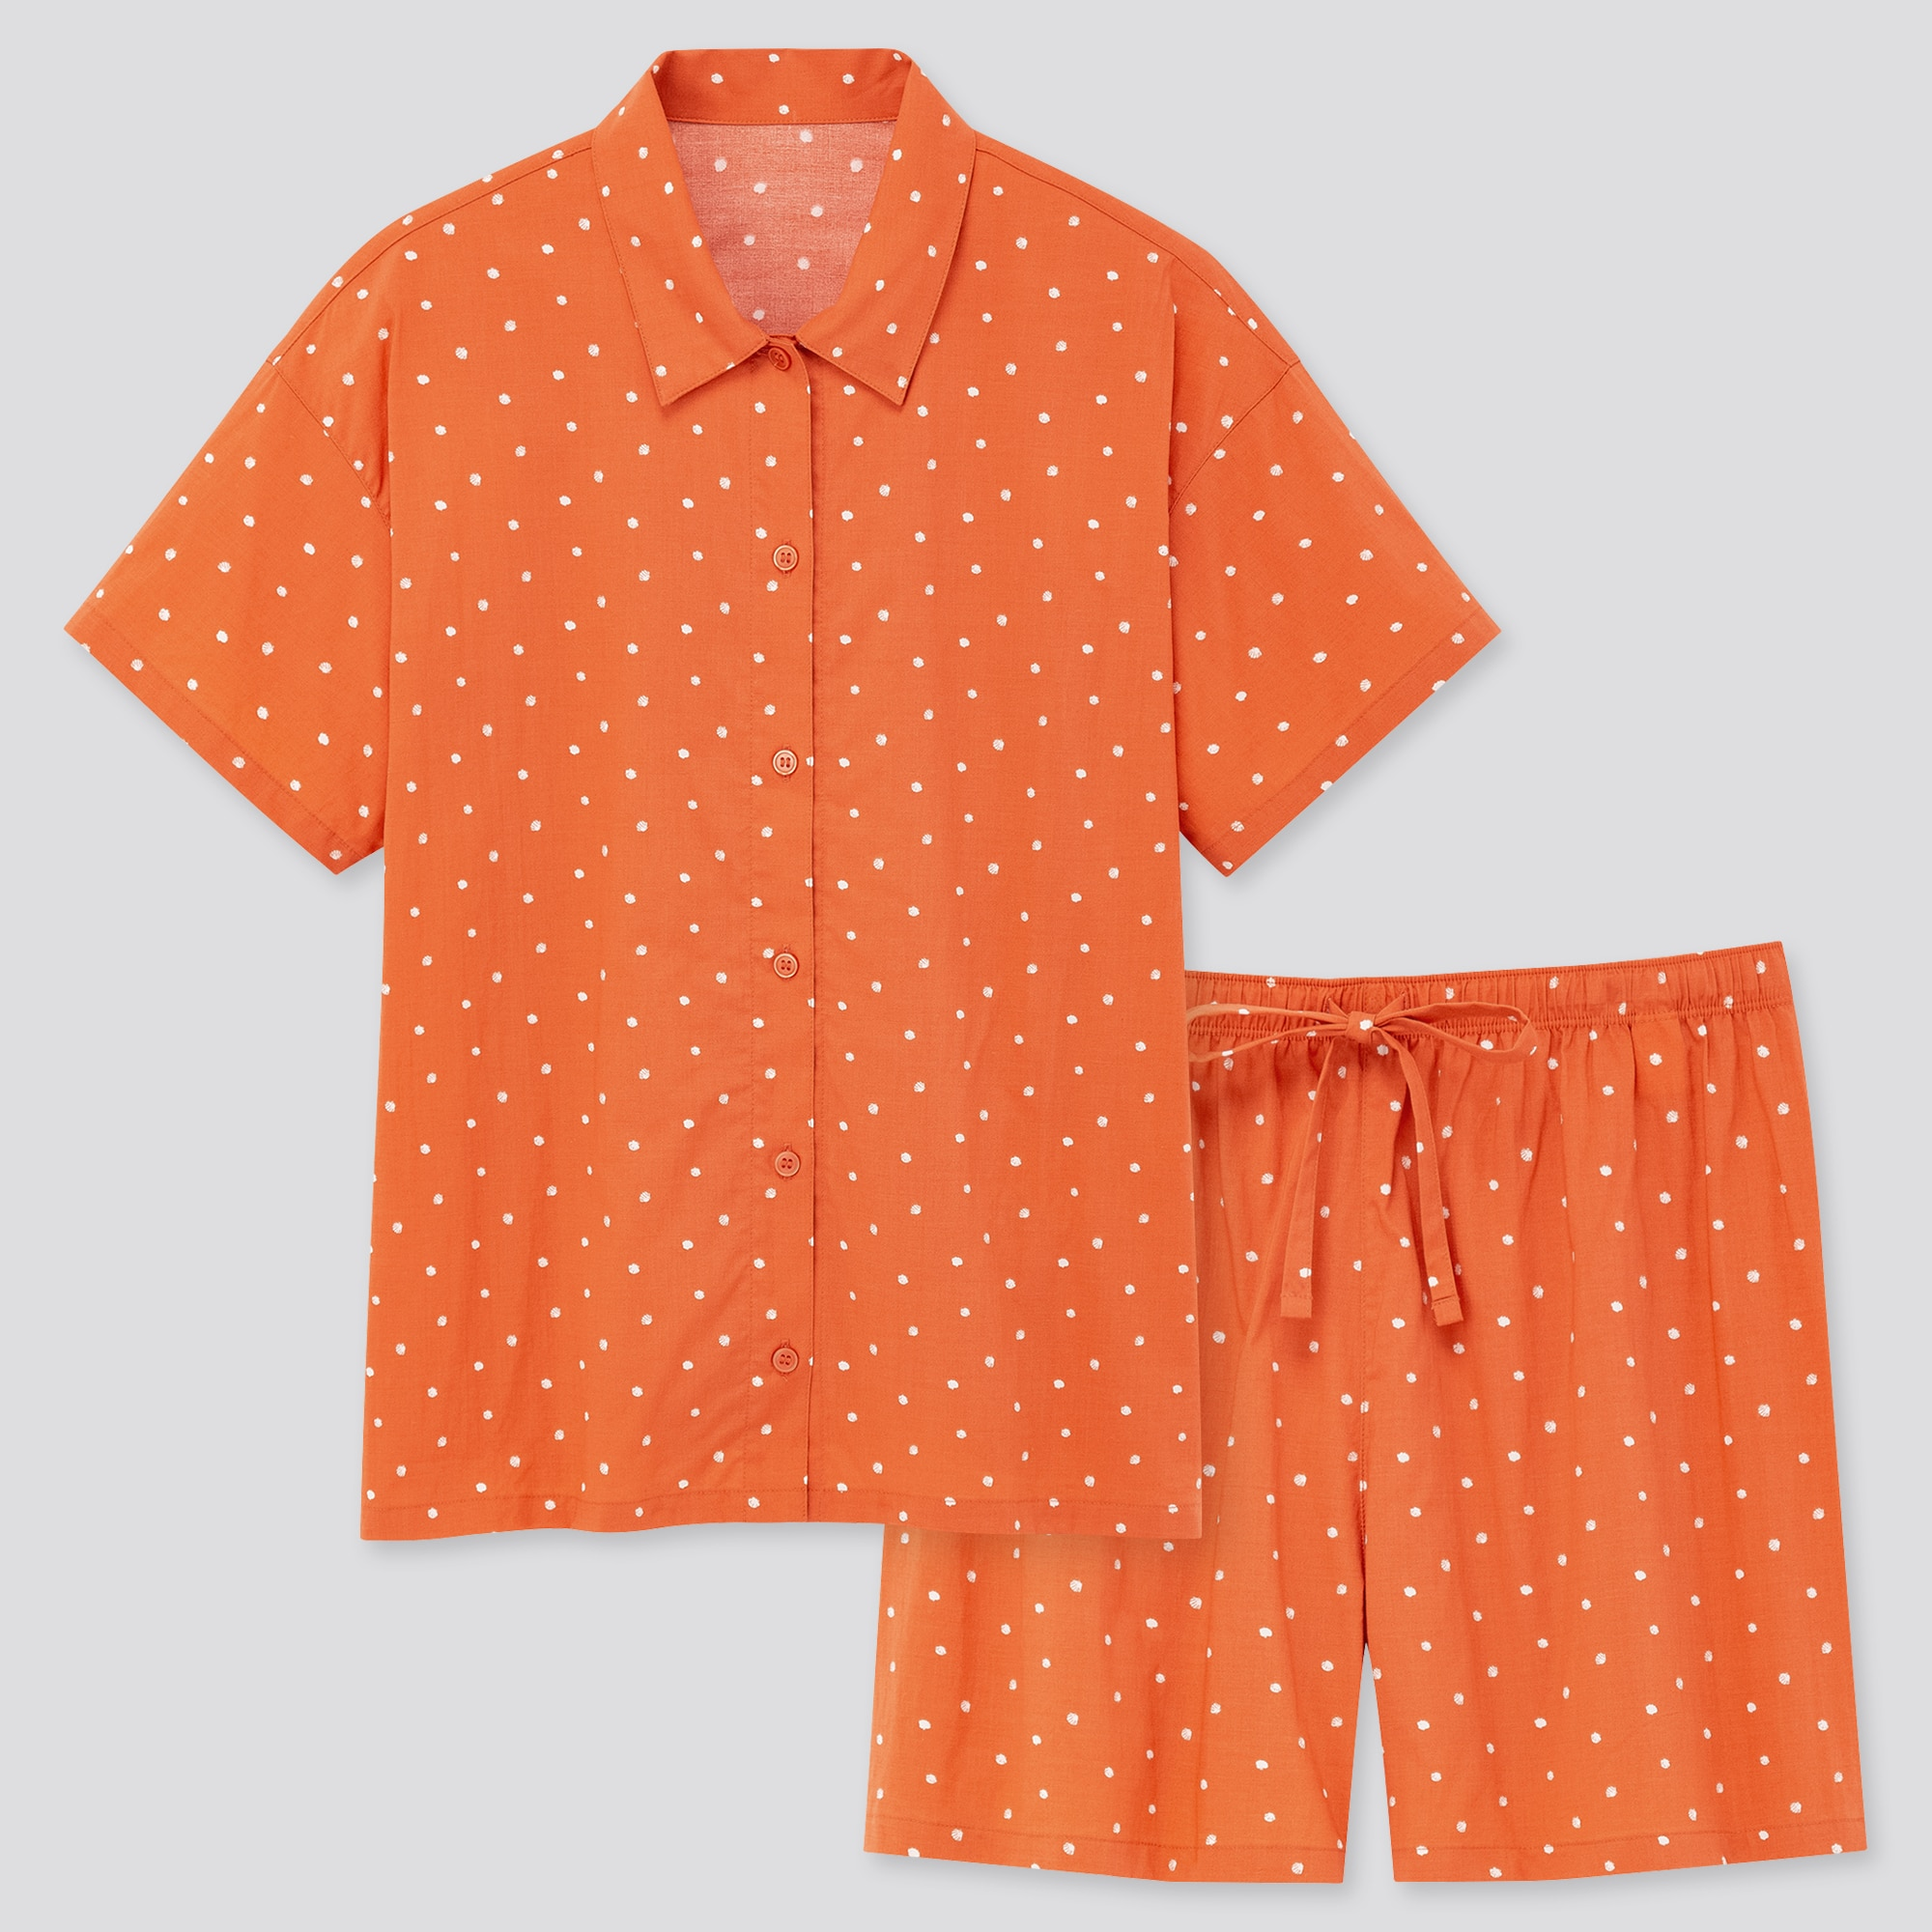 Women Soft Stretch Short Sleeved Pyjamas